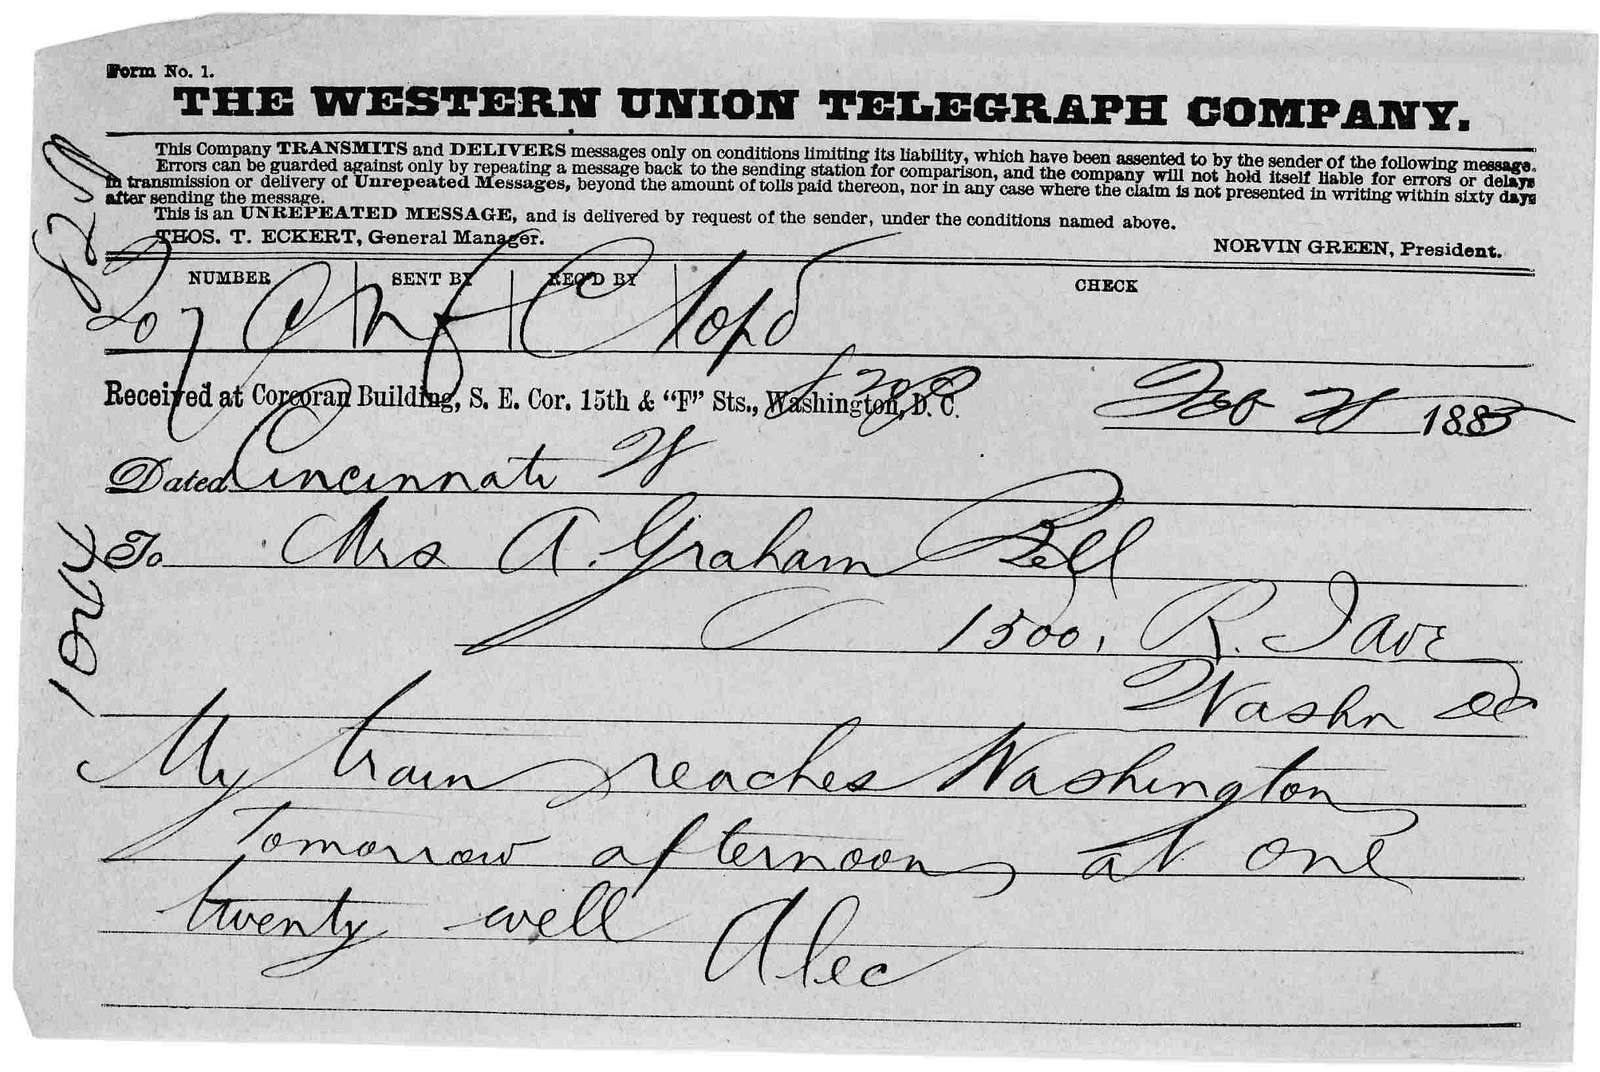 Telegram from Alexander Graham Bell to Mabel Hubbard Bell, February 20, 1885